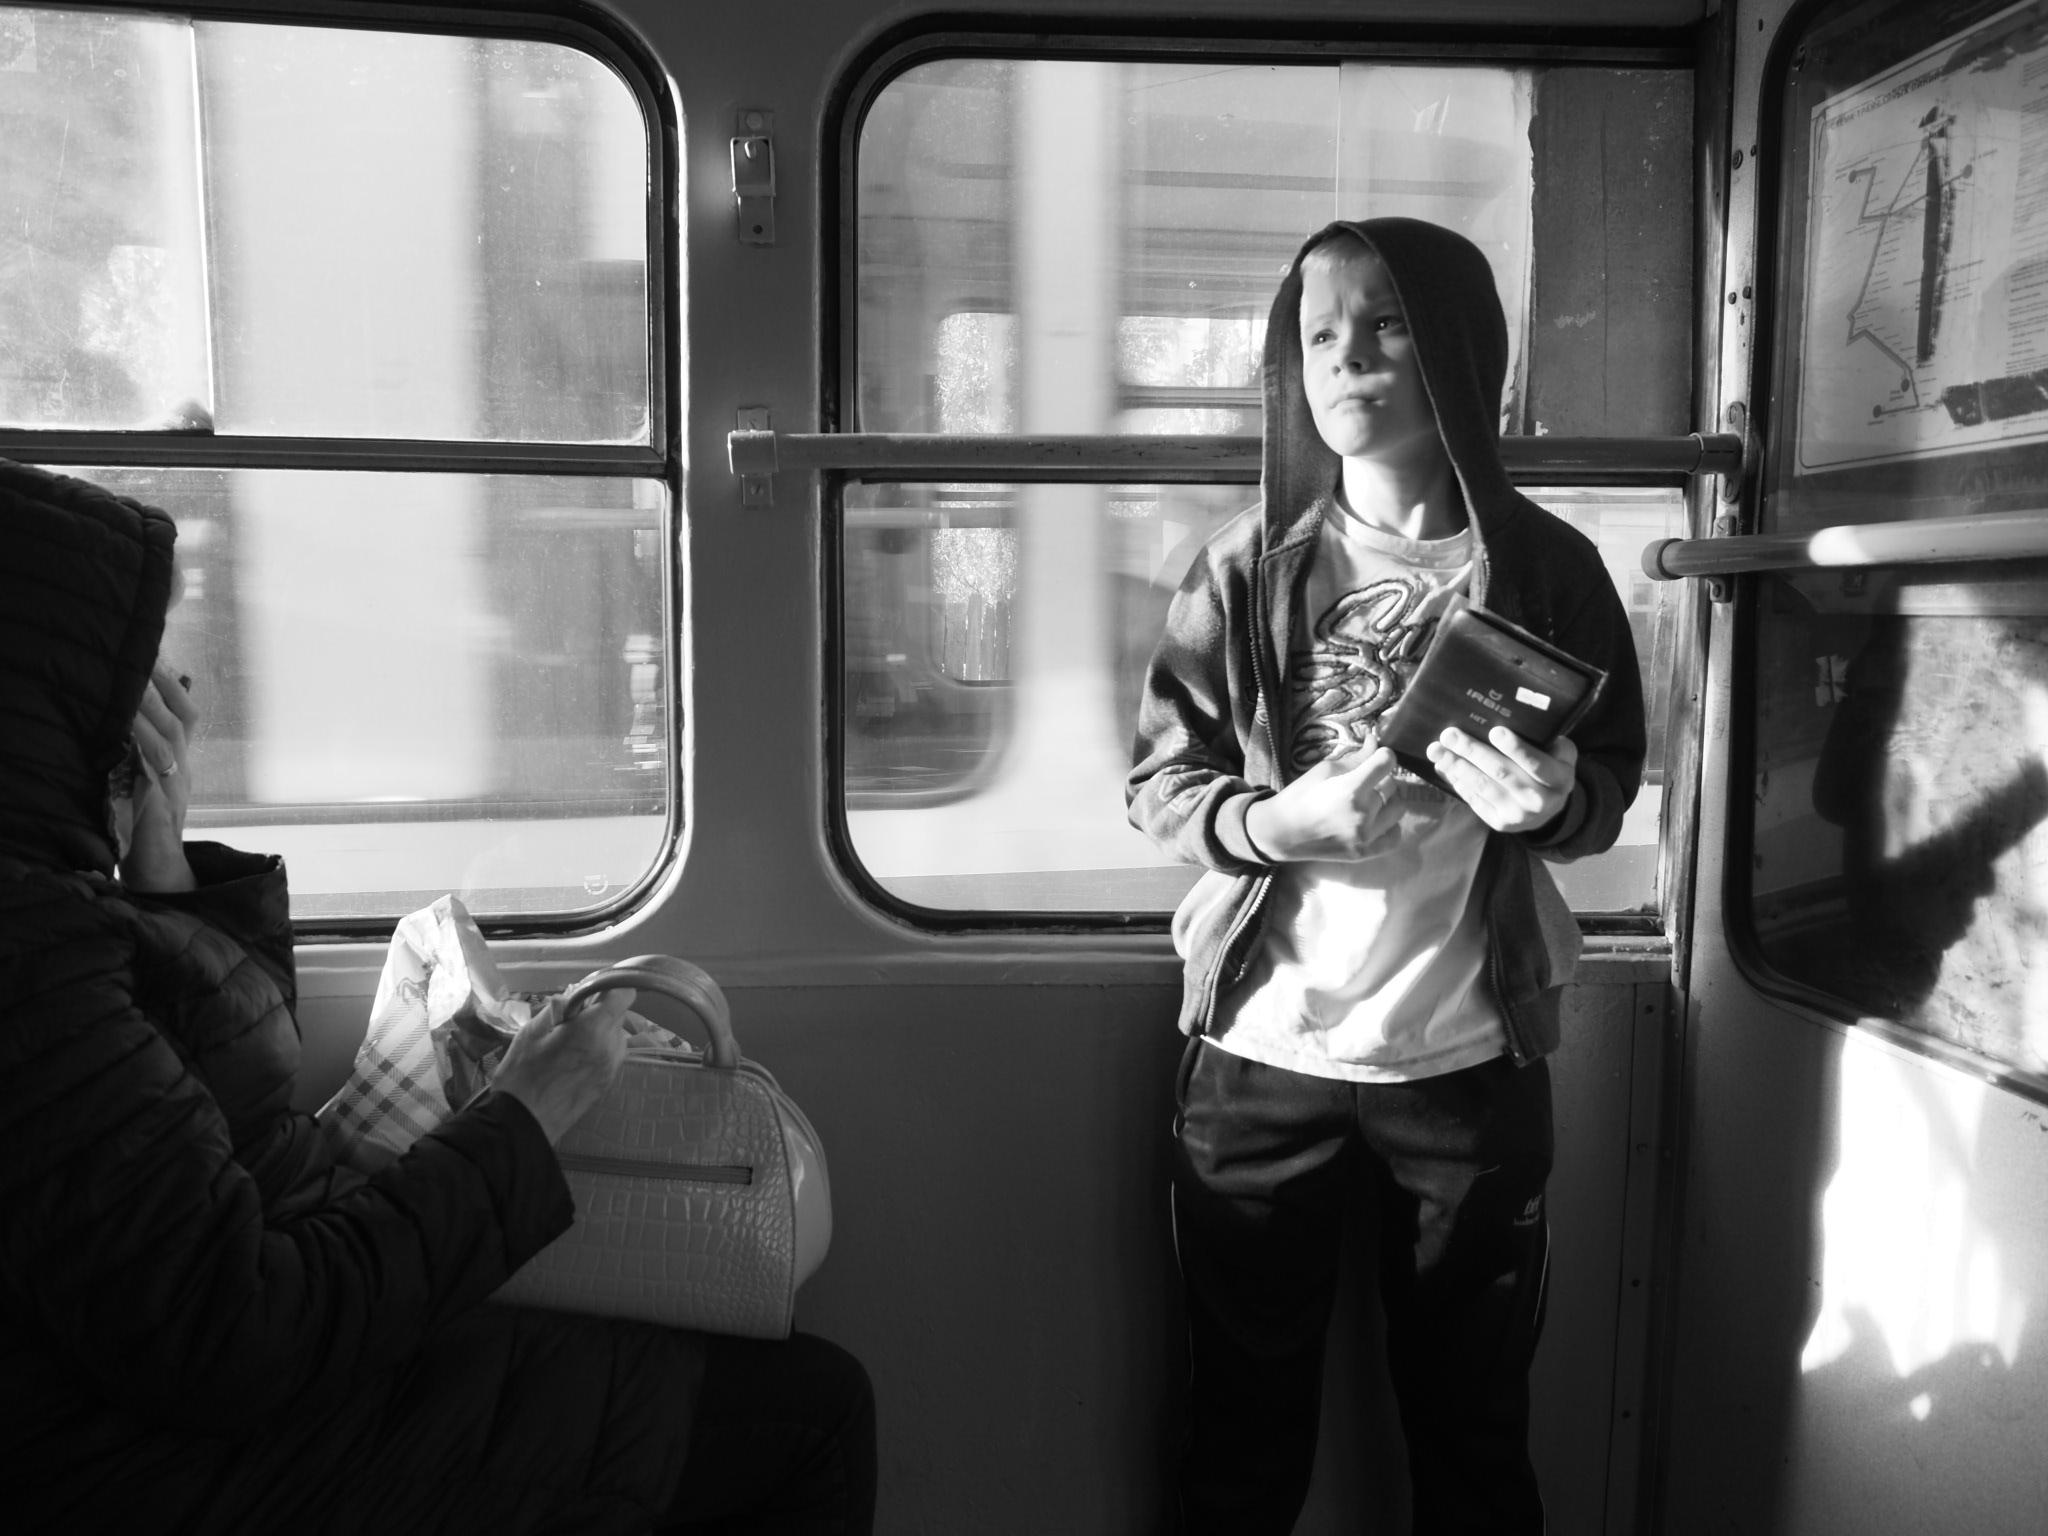 Into the tram, Russia...